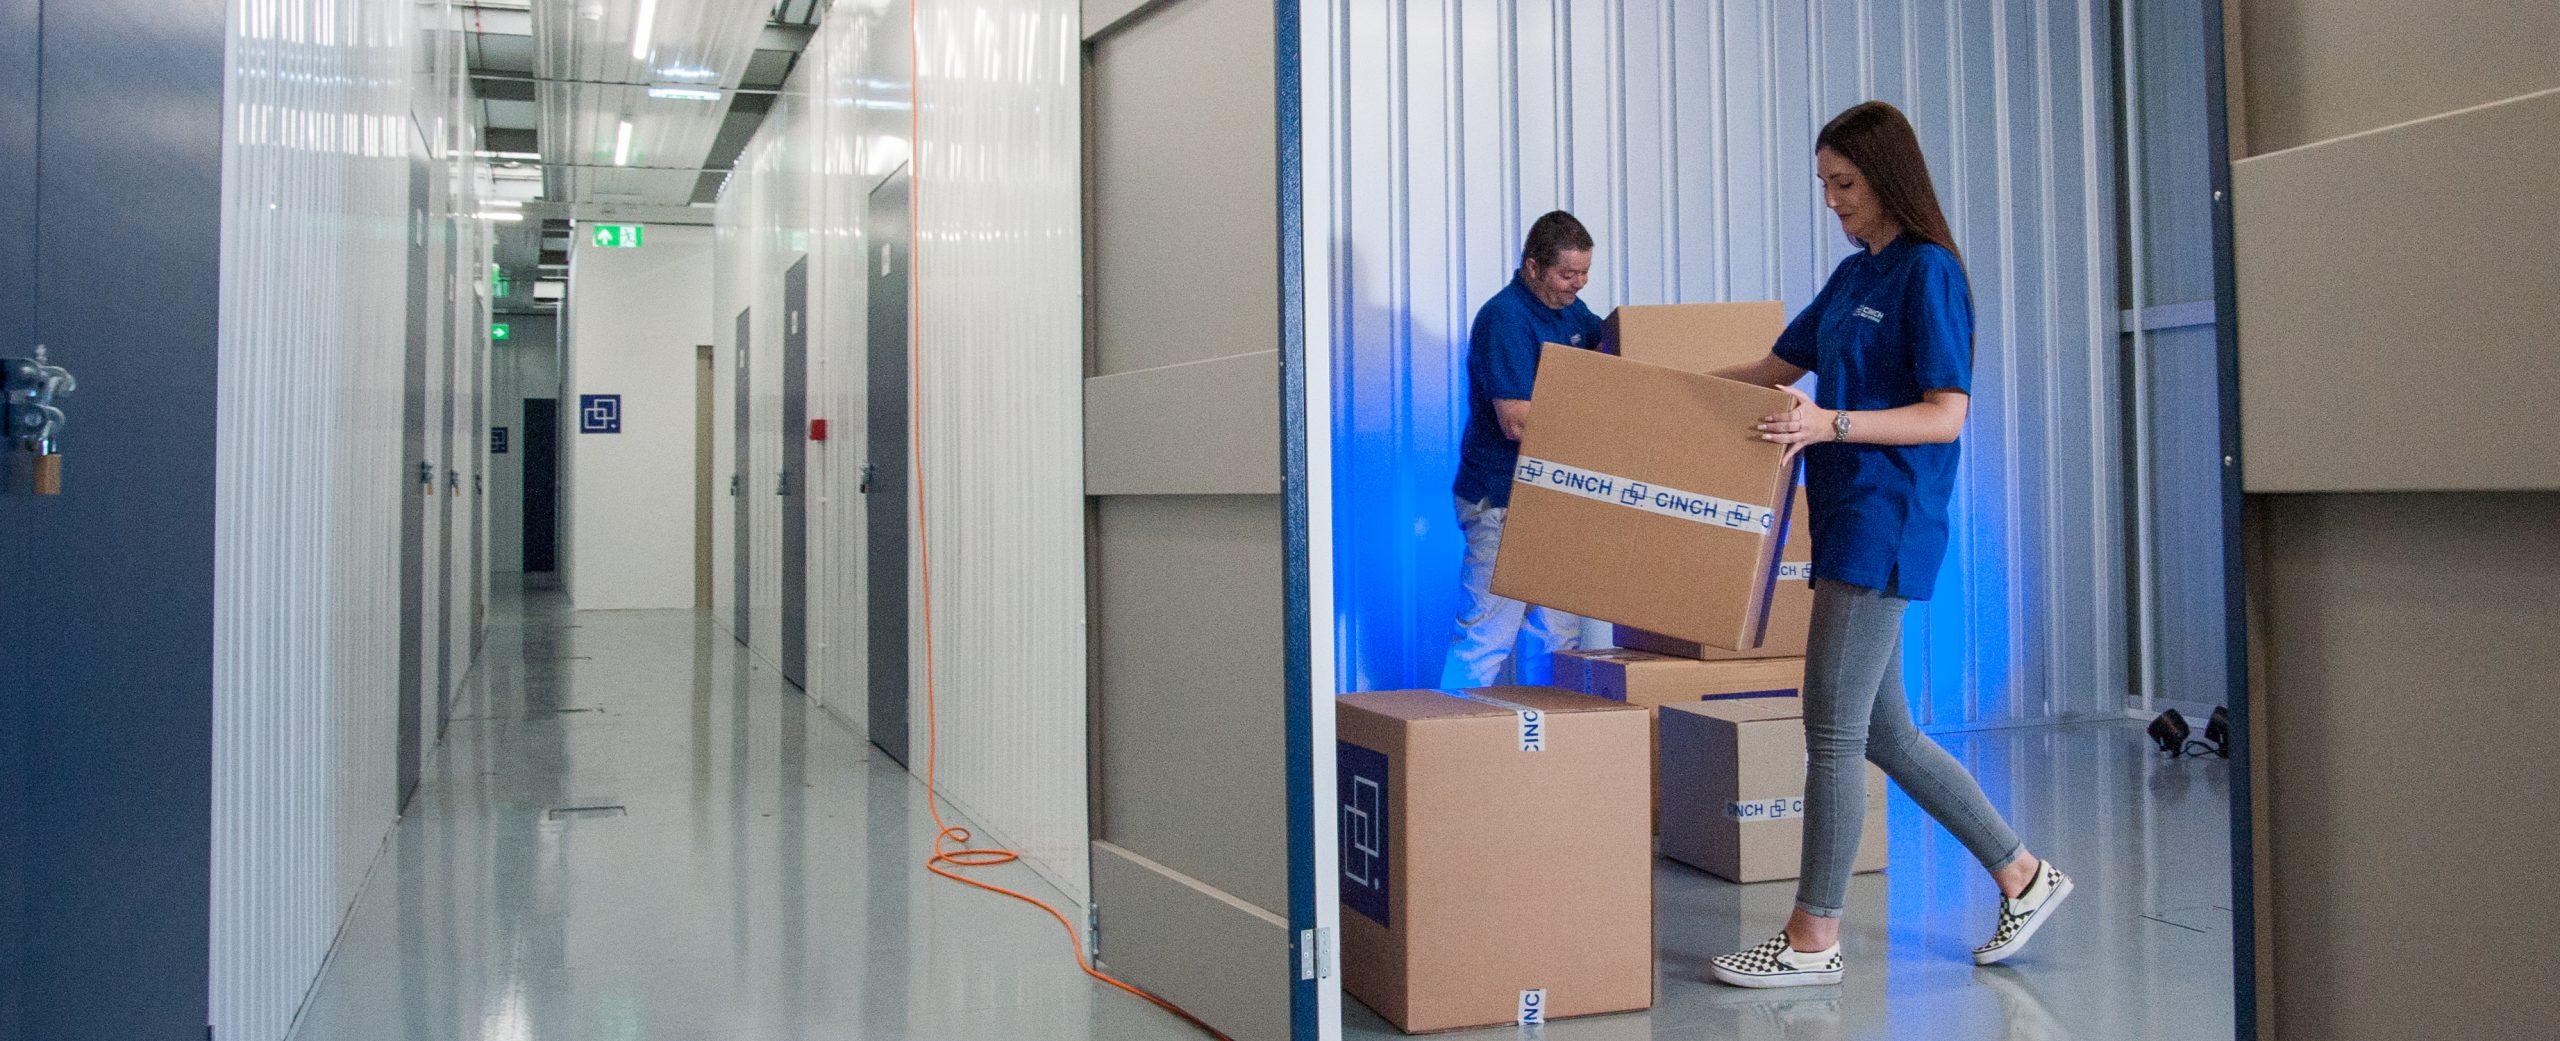 Cinch self storage staff helping customer move in